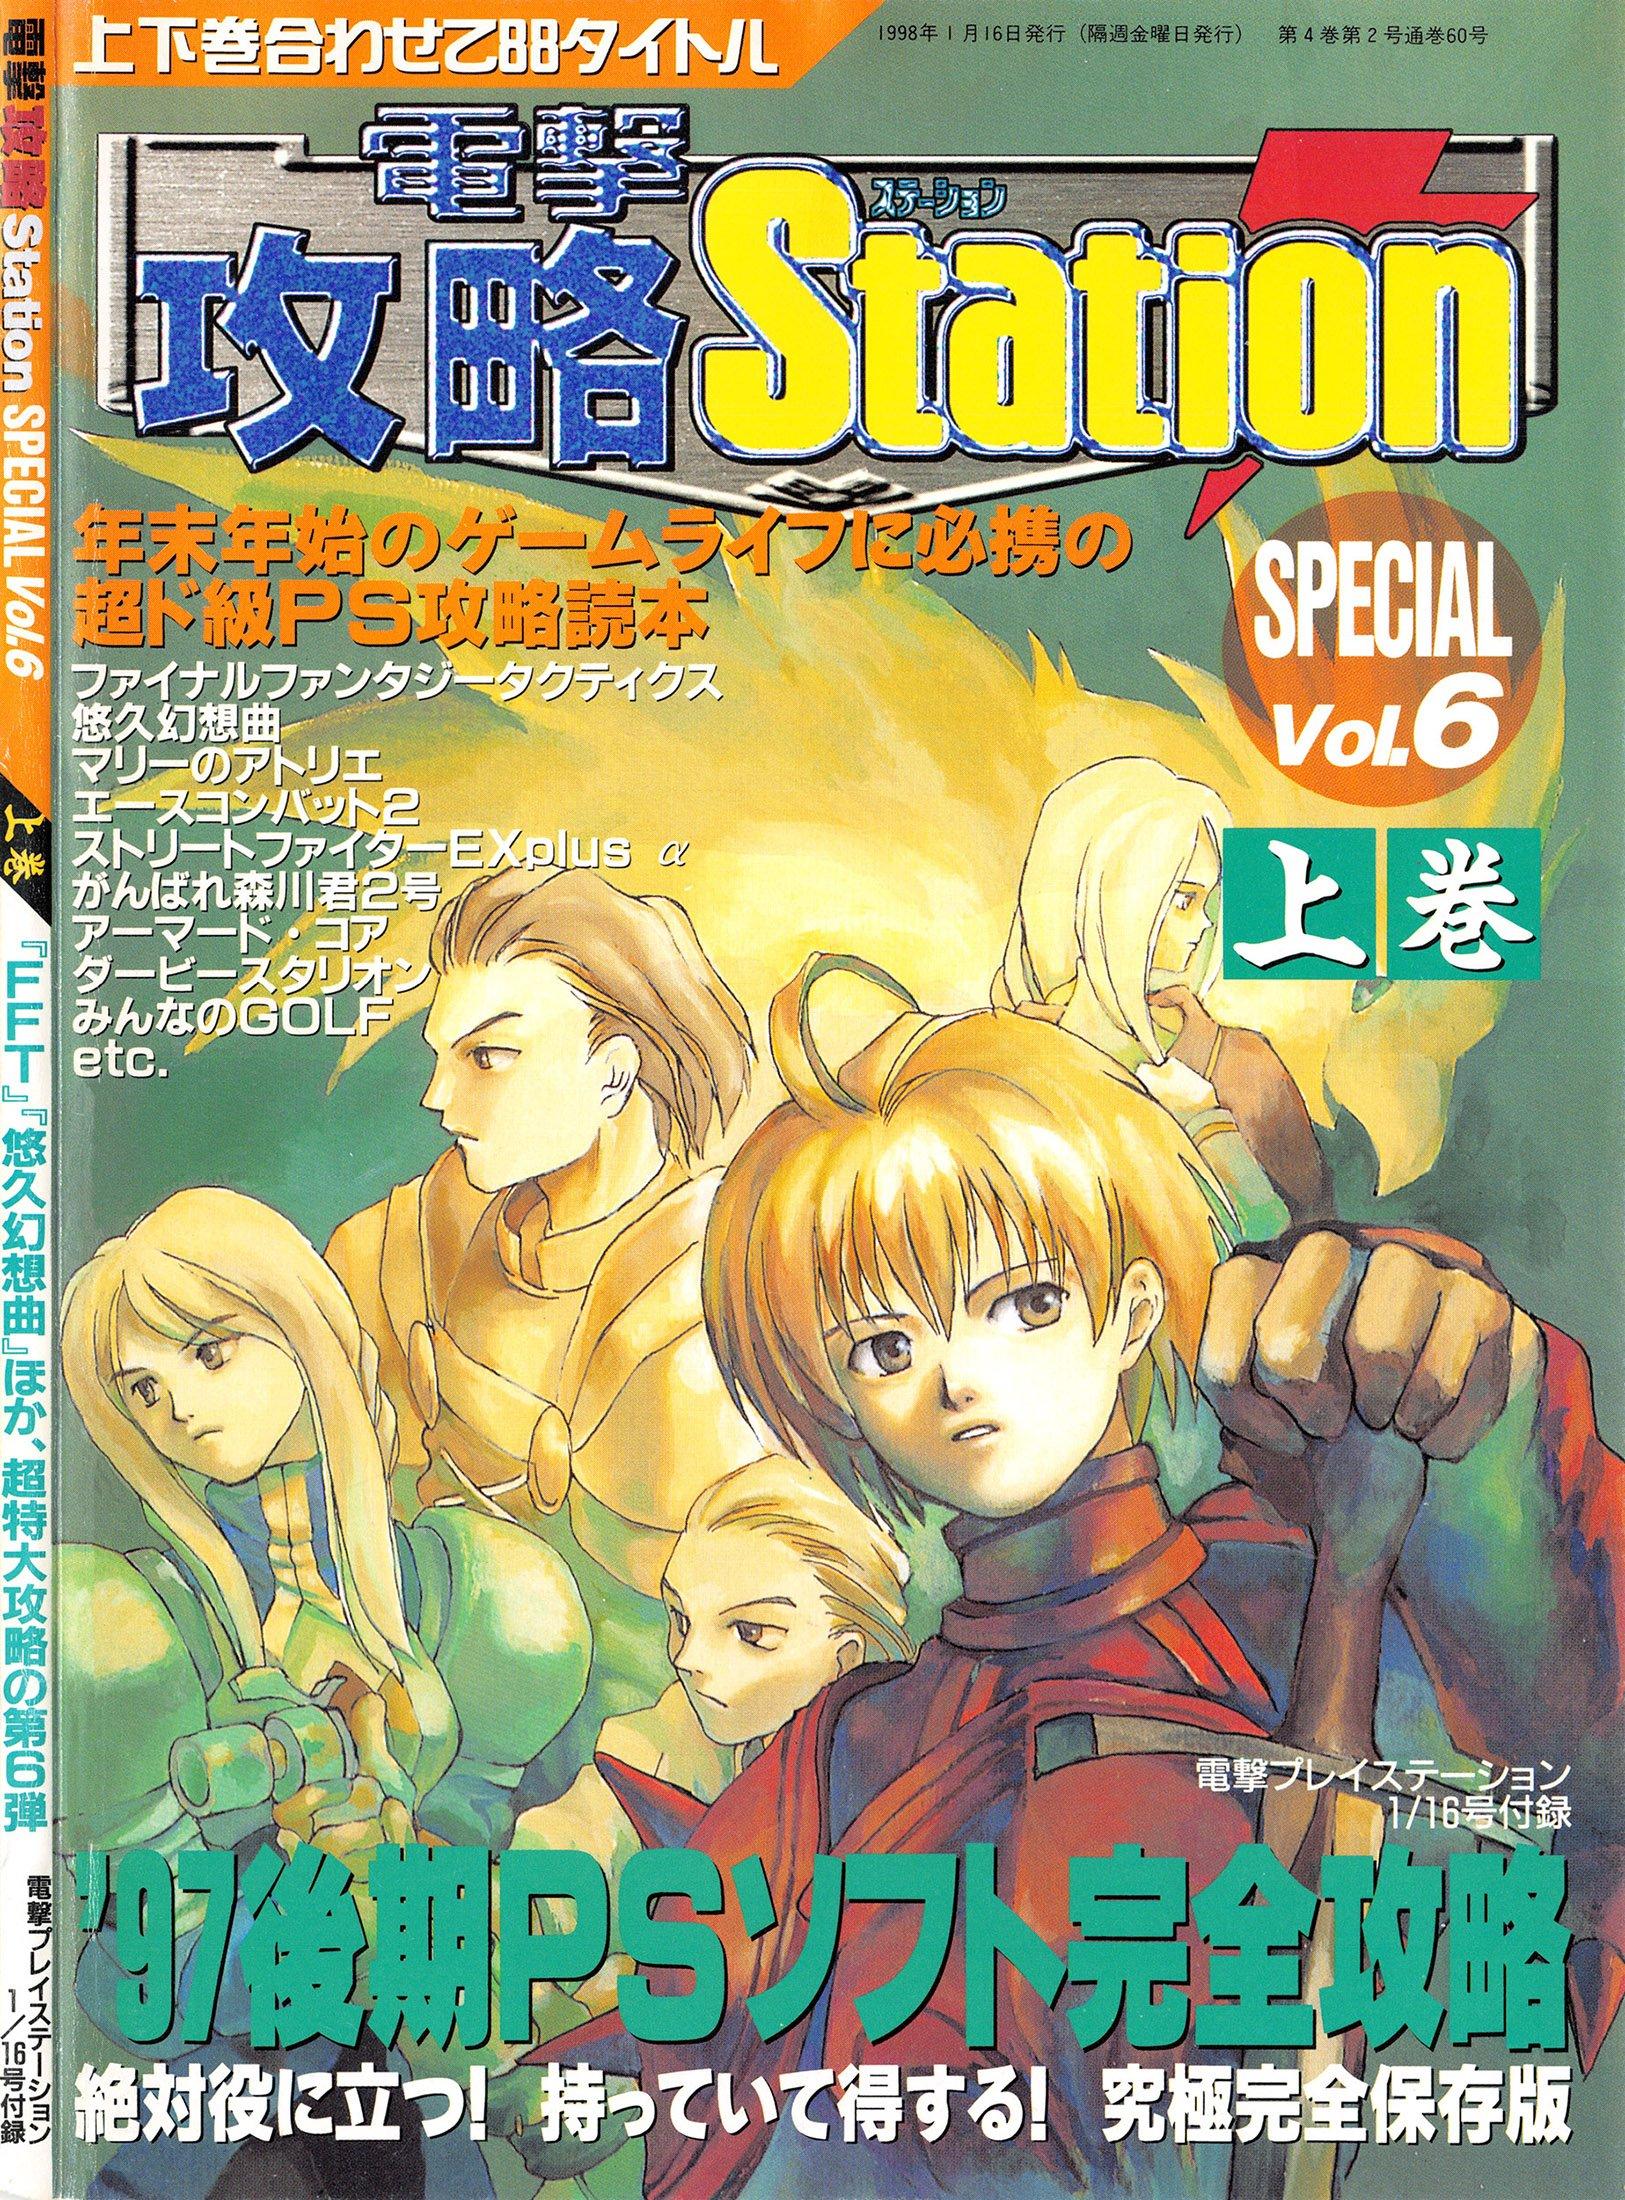 Dengeki Kouryaku Station Special Vol.6 joukan (Vol.64 supplement) (January 16, 1998)